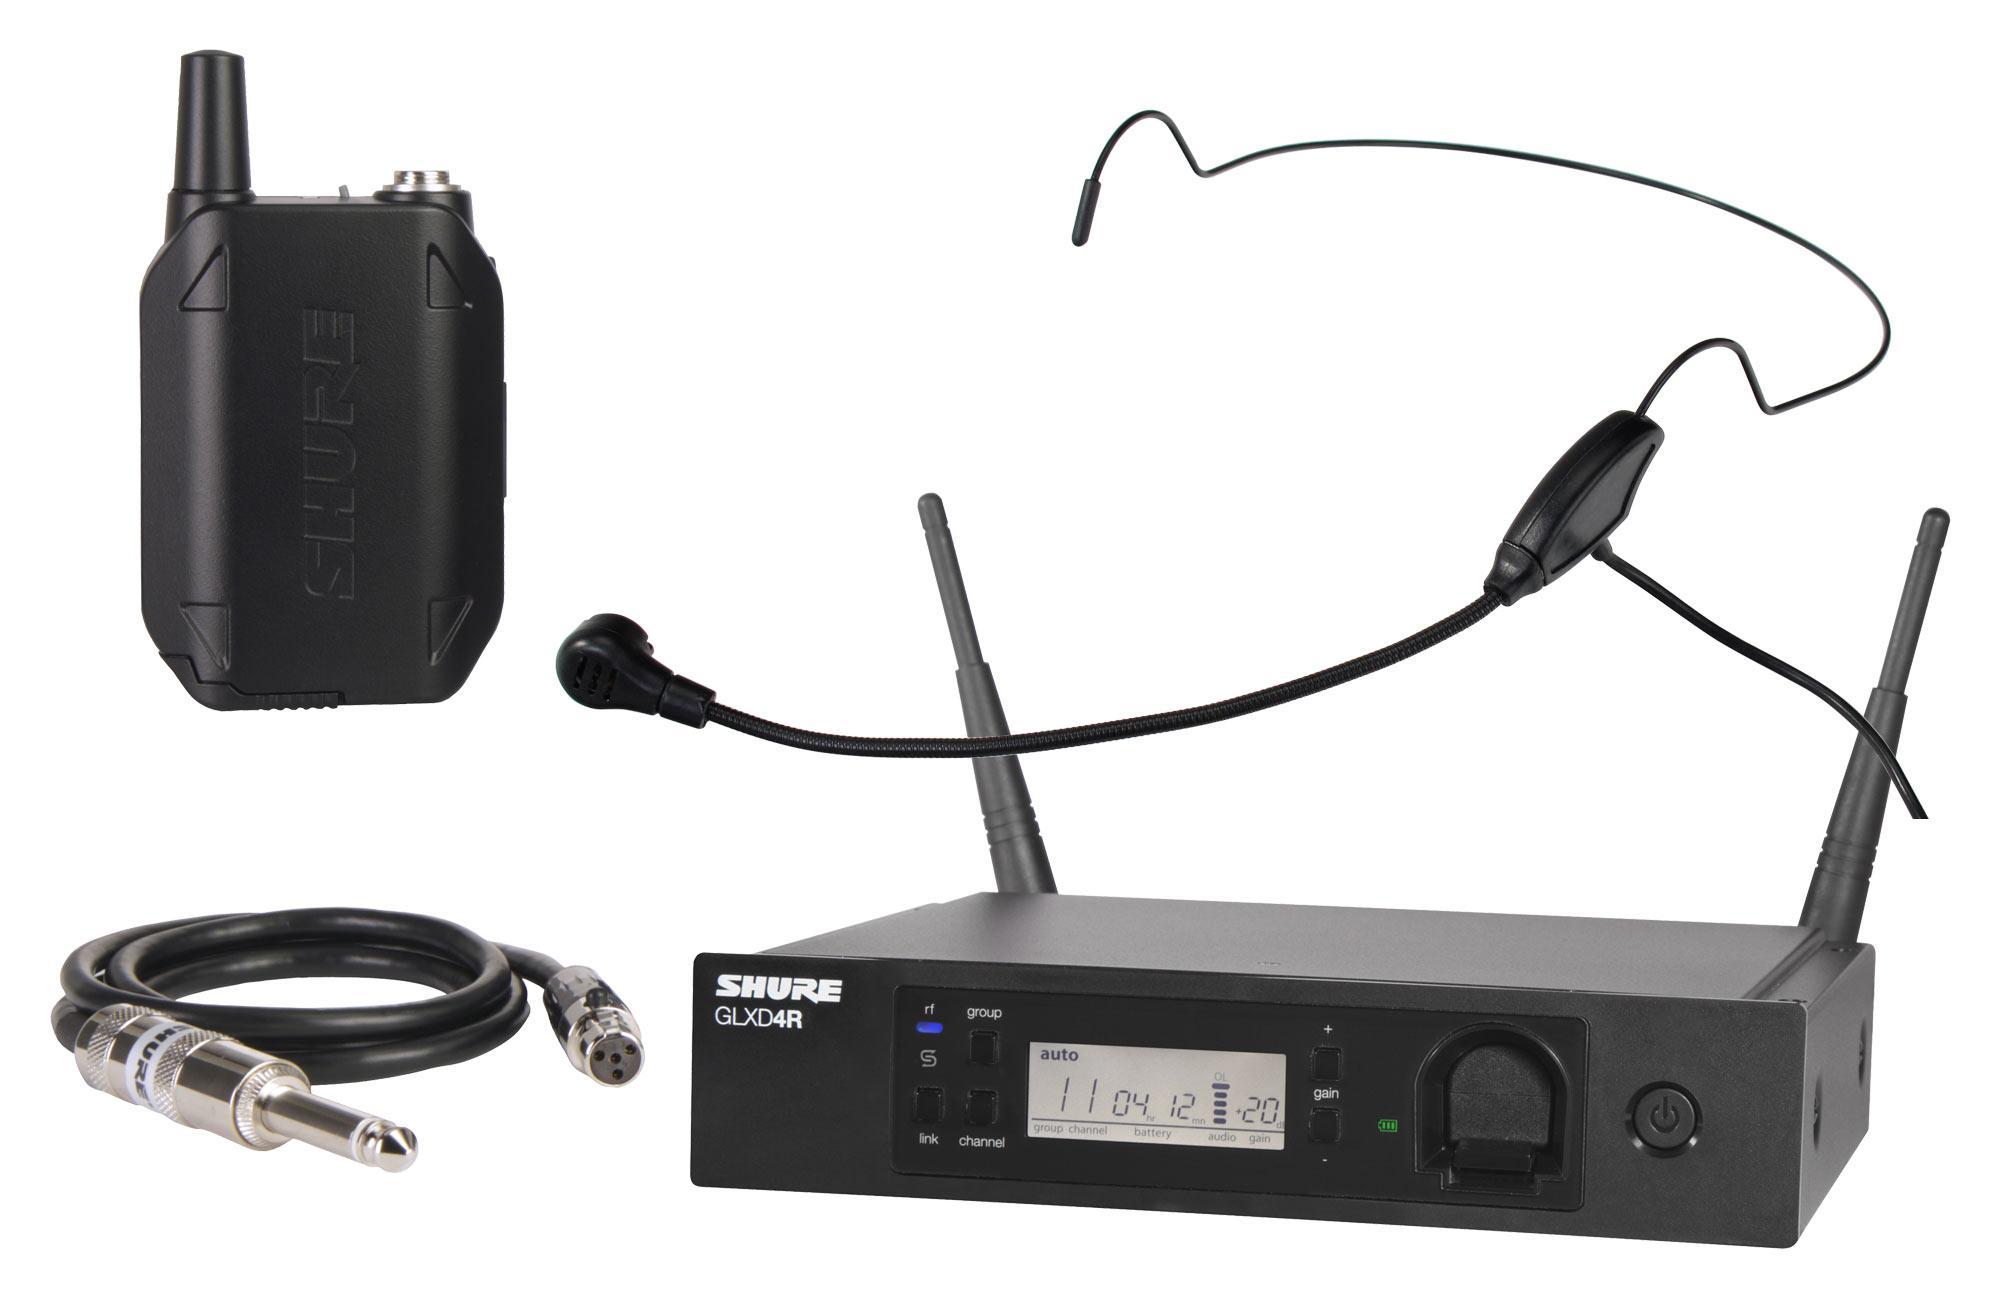 Shure GLXD14R Digital Funksystem Set inkl. HS 65 Headsetmikrofon